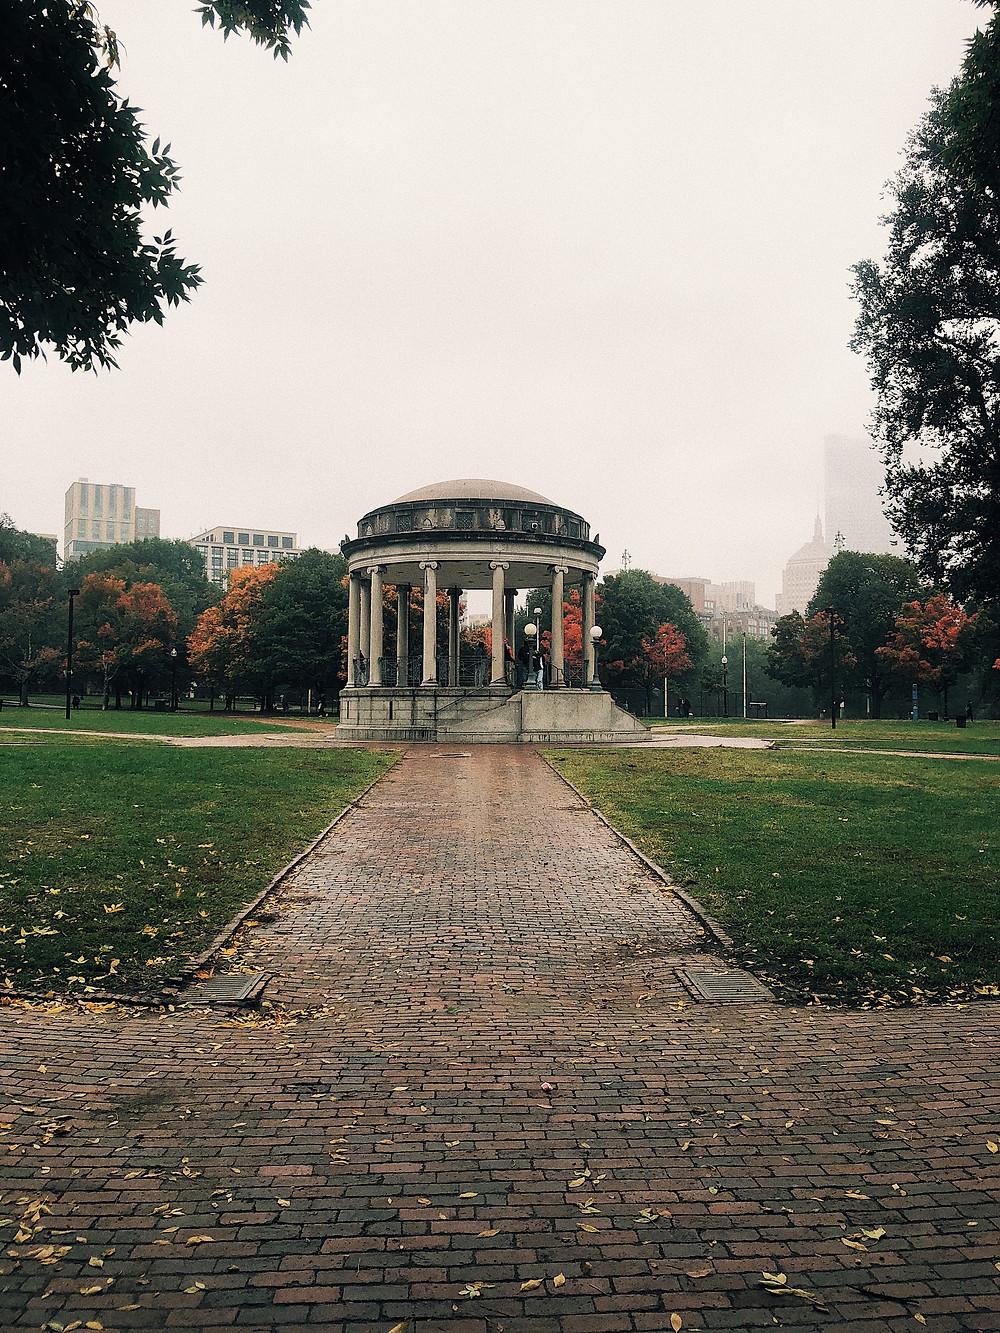 Boston Common. Boston, MA International Students in US blog, alien thoughts